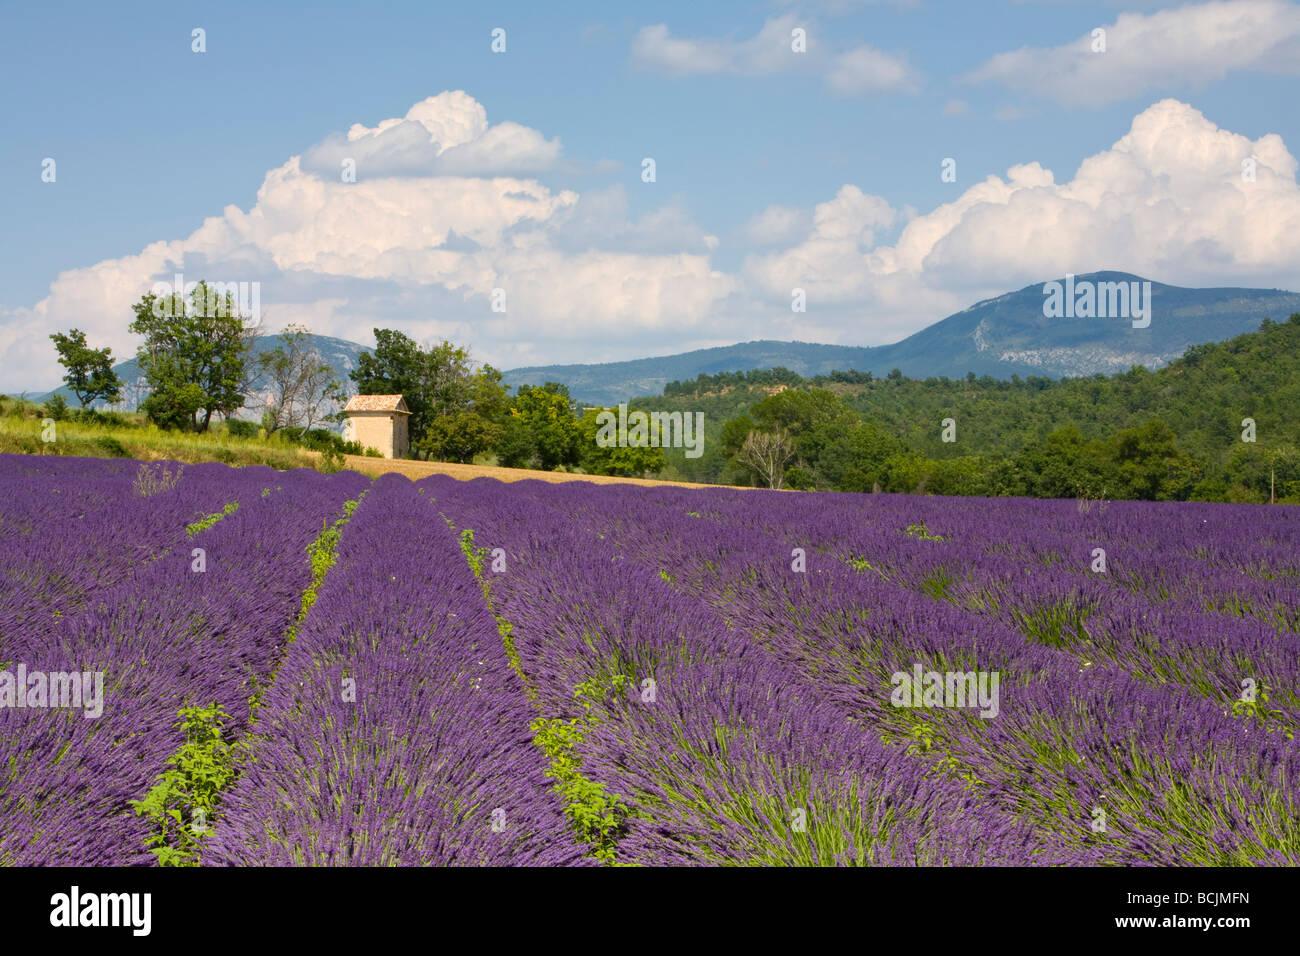 Lavender Field, Provence-Alpes-Cote d'Azur, France, RF - Stock Image